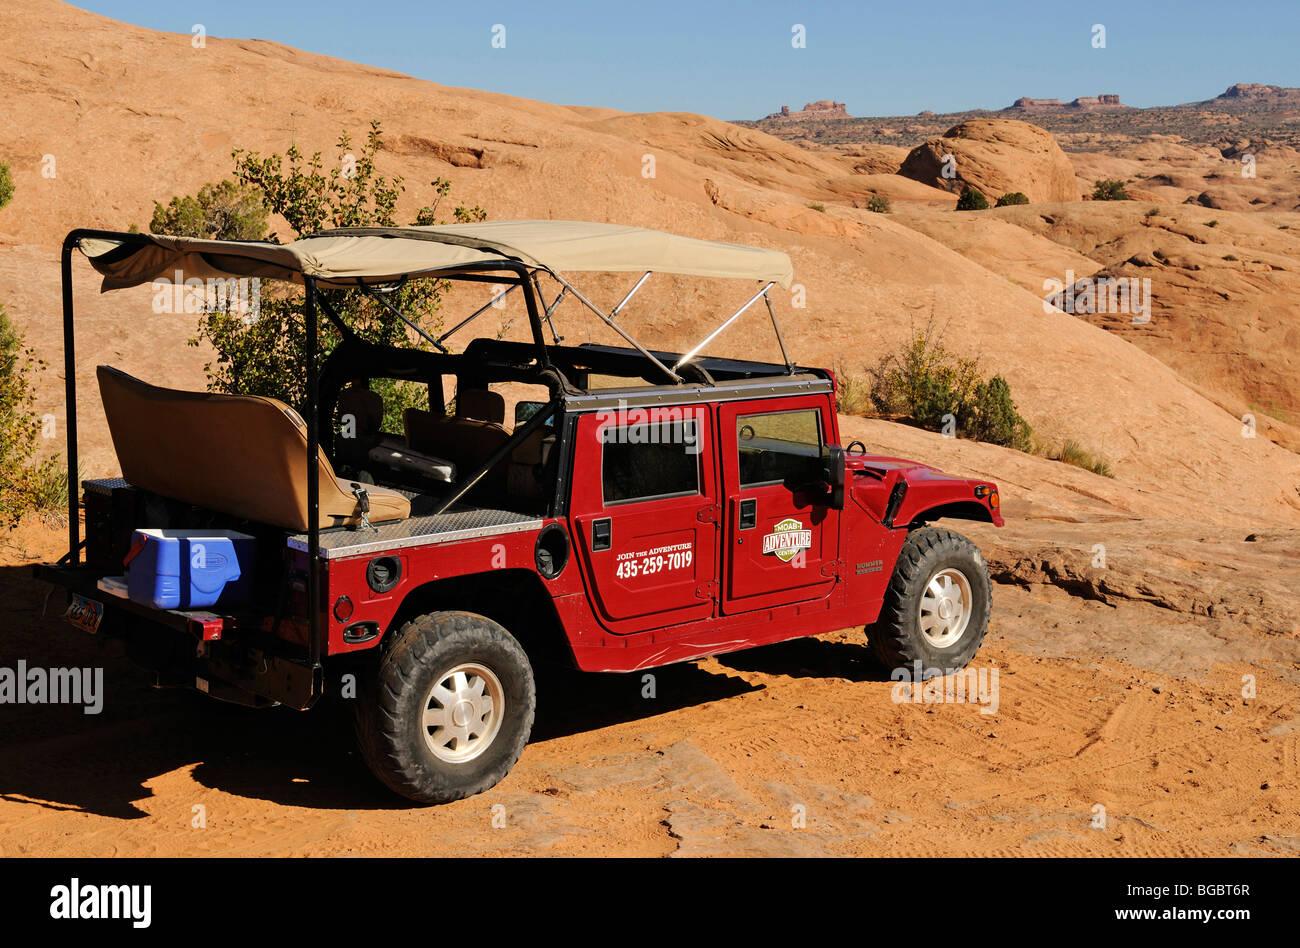 Cross-country vehicle, Hummer tour, Slickrock Trail, Moab, Utah, USA - Stock Image